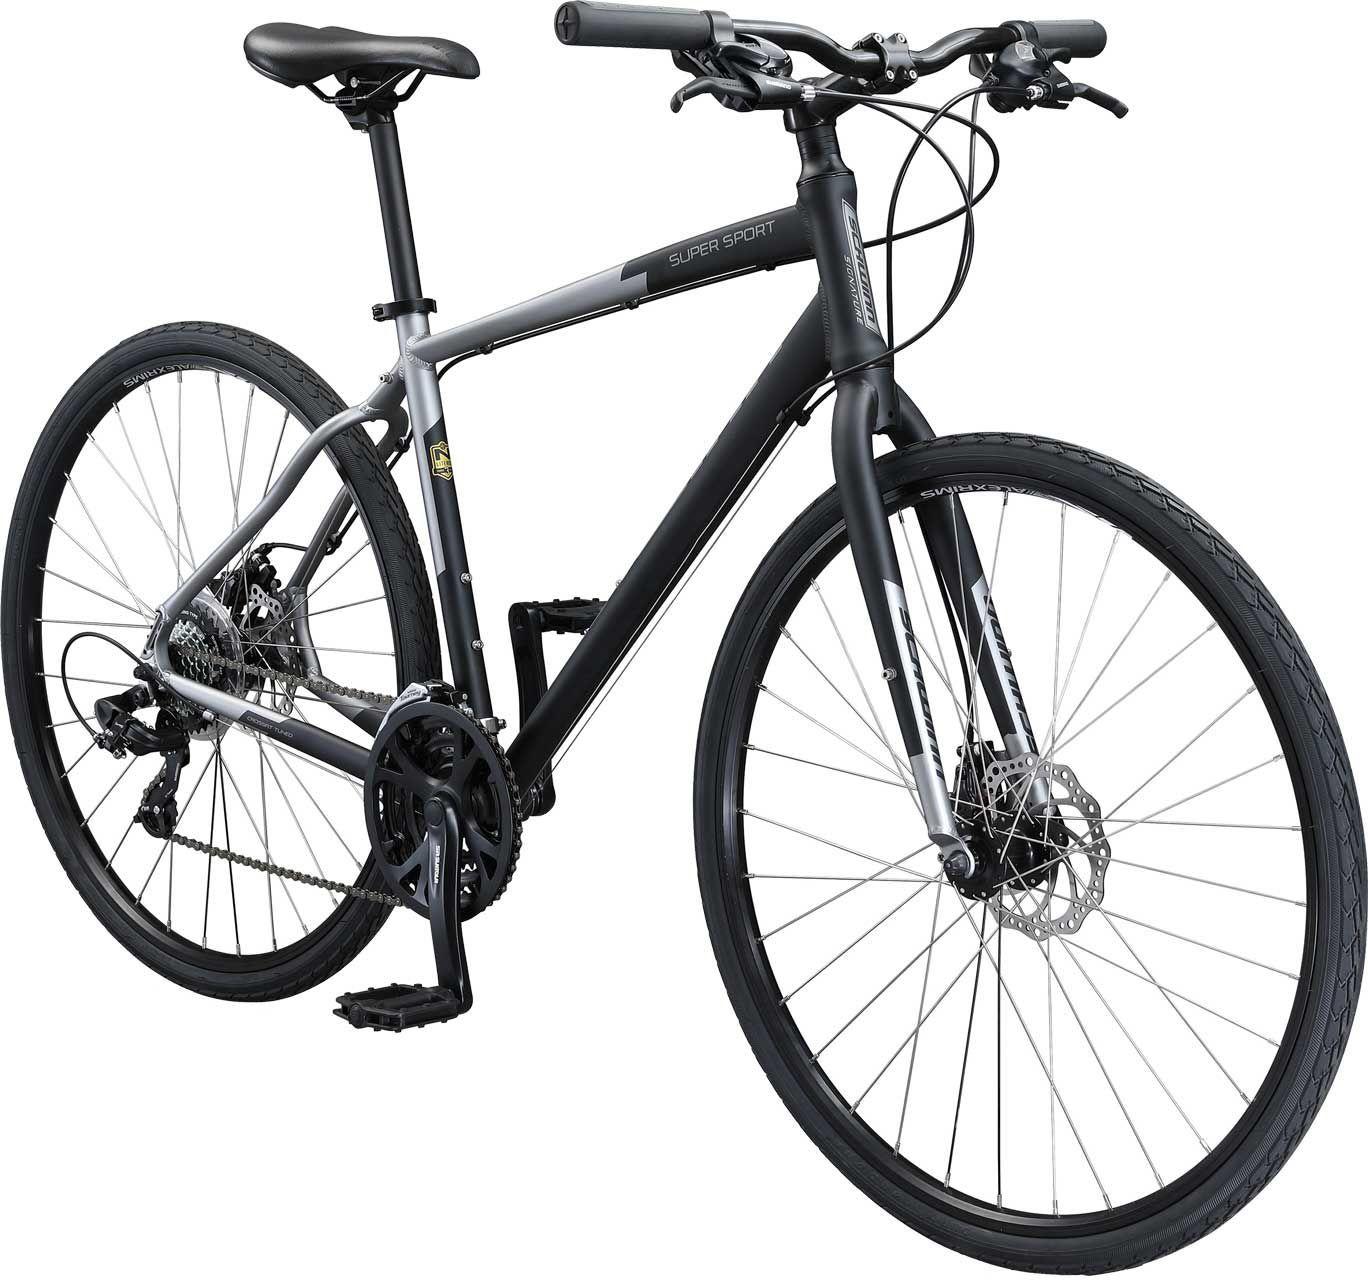 Schwinn Signature Men's Super Sport Hybrid Bike, Size 17